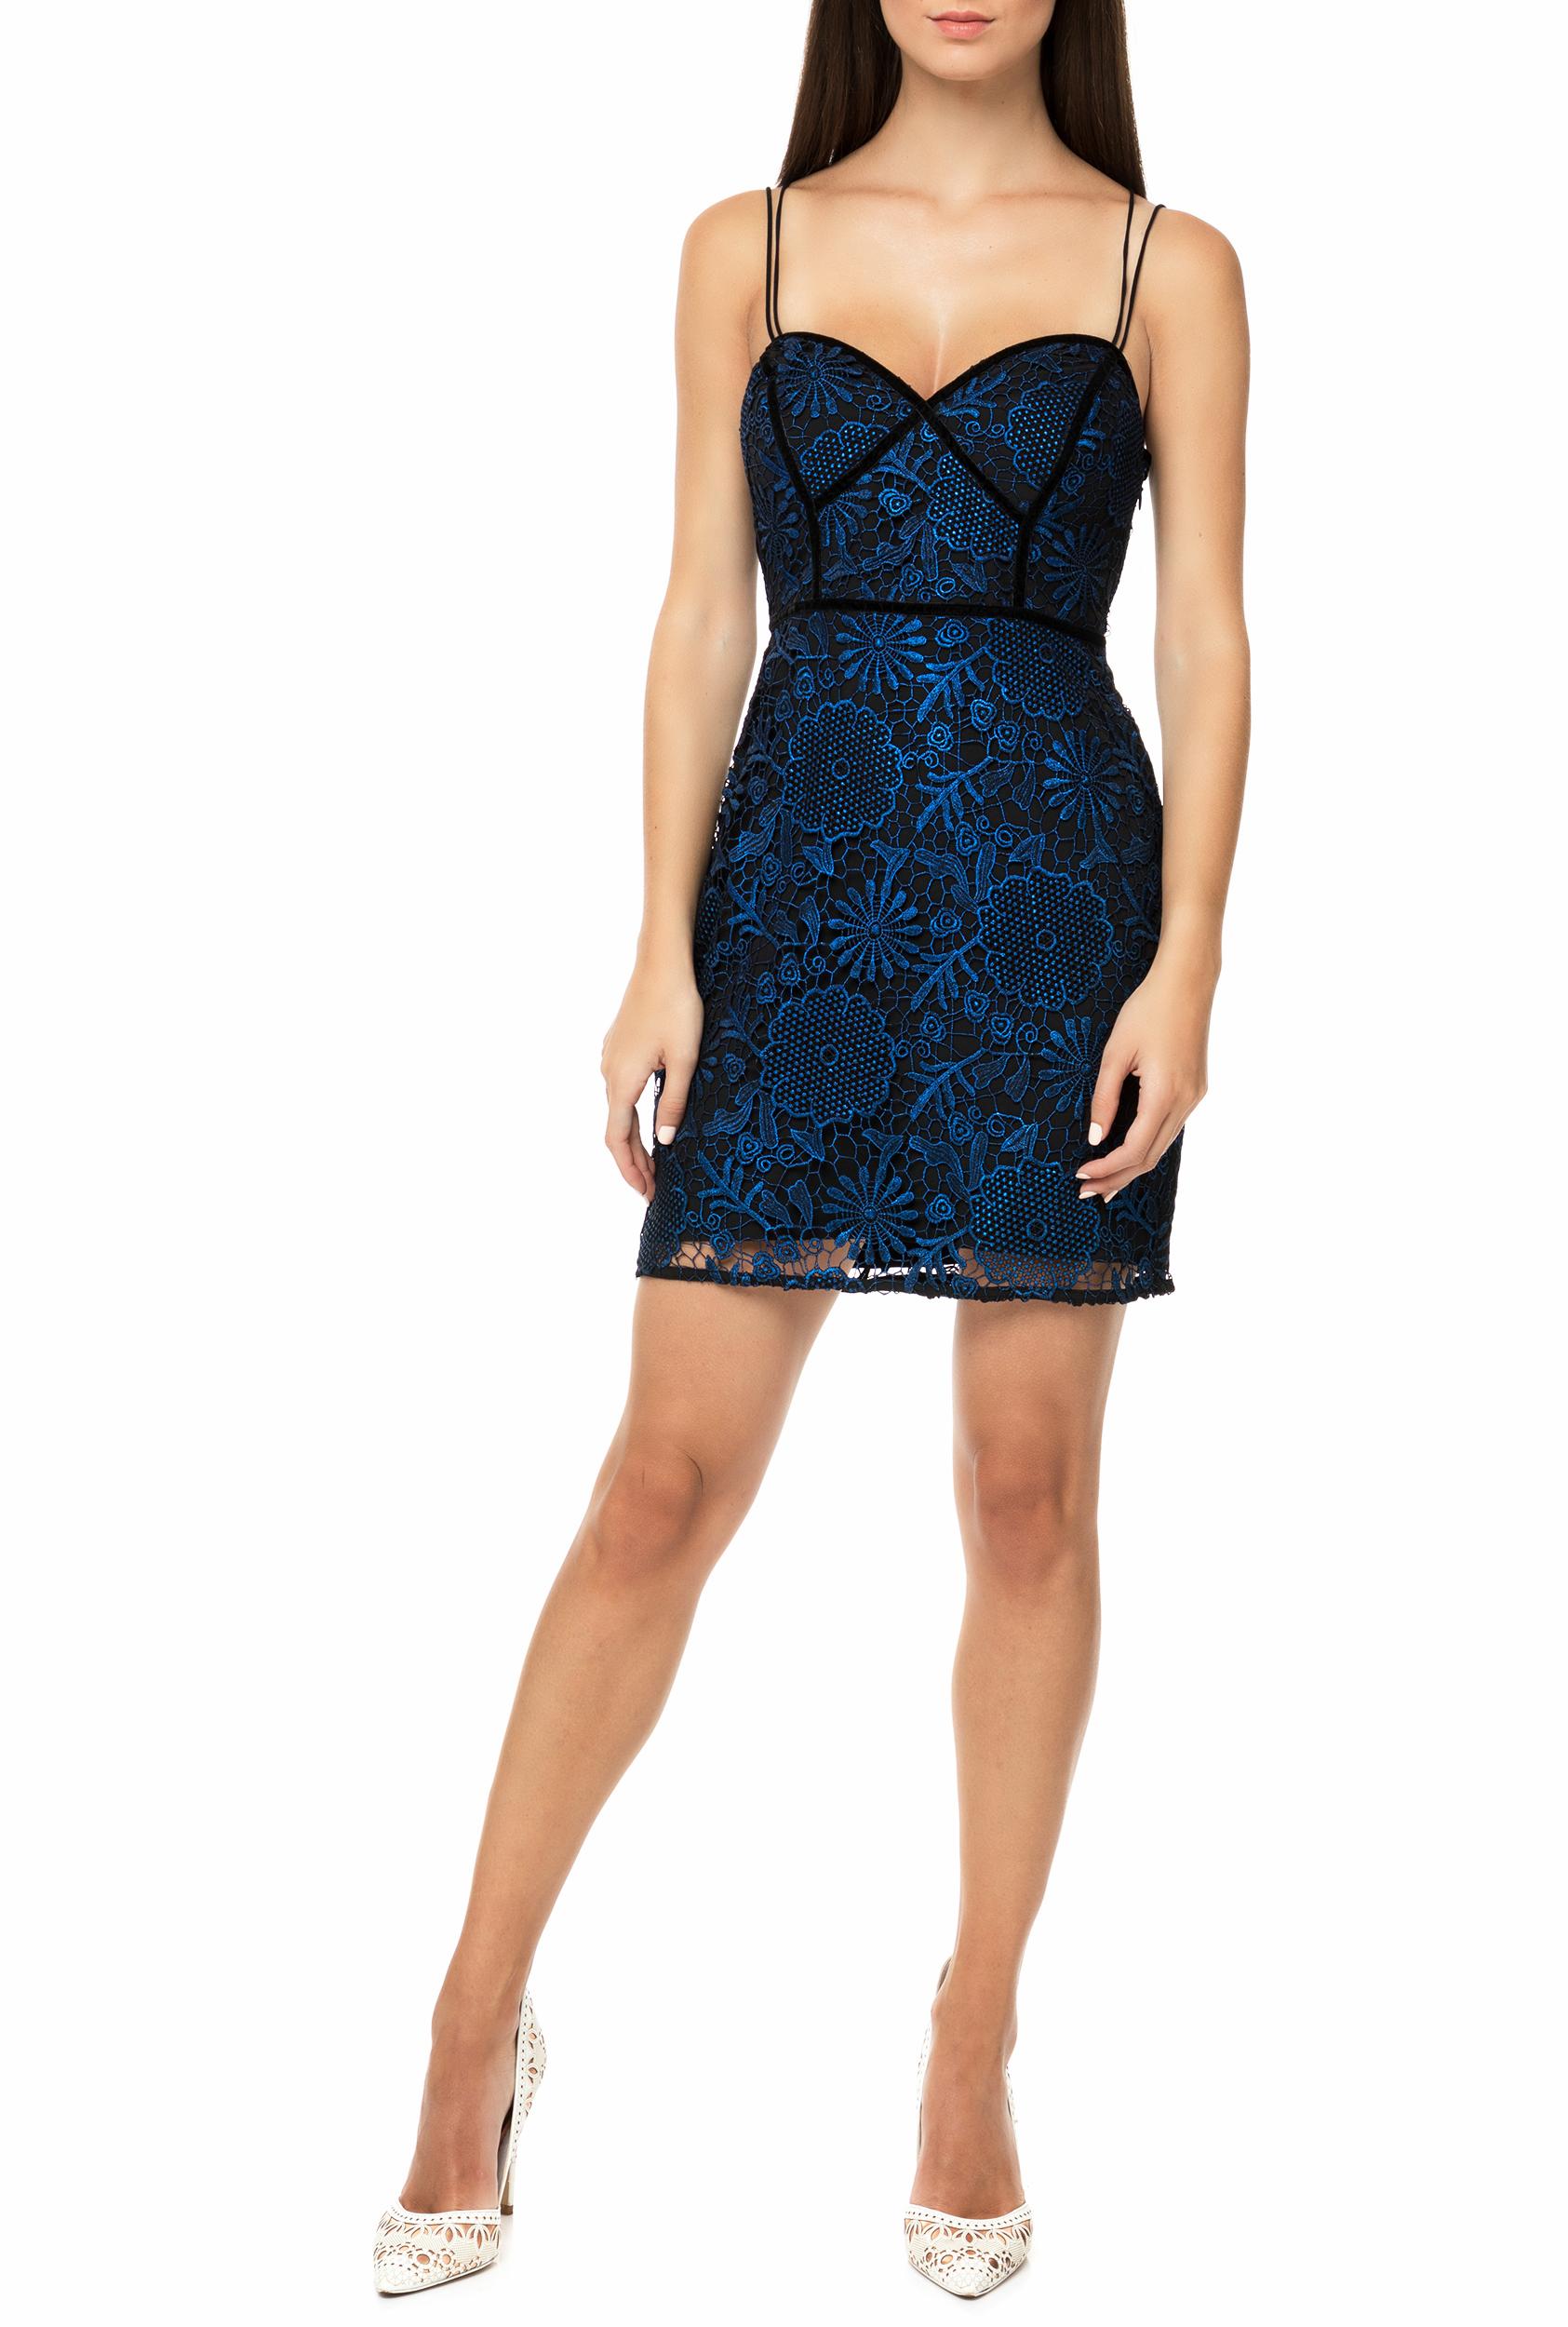 e0b36ea7a0f9 GUESS - Γυναικείο μίνι φόρεμα με δαντέλα GUESS ADINA μαύρο - μπλε